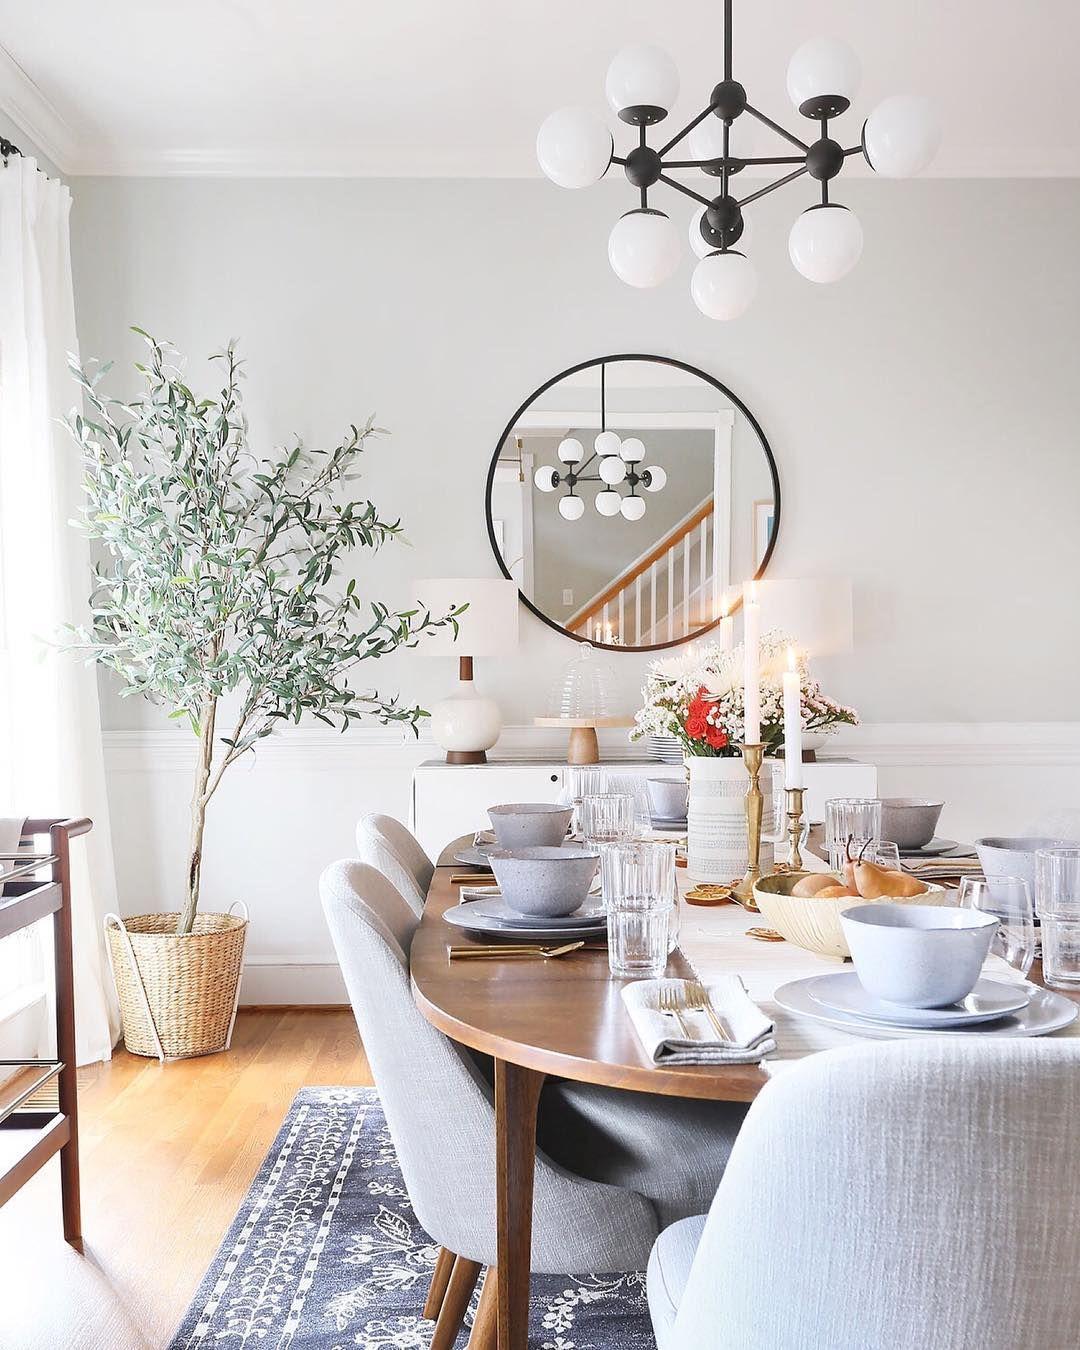 19 Urban Dining Room Designs Decorating Ideas: Today On The Blog, I'm Sharing My Warm, Modern, Organic